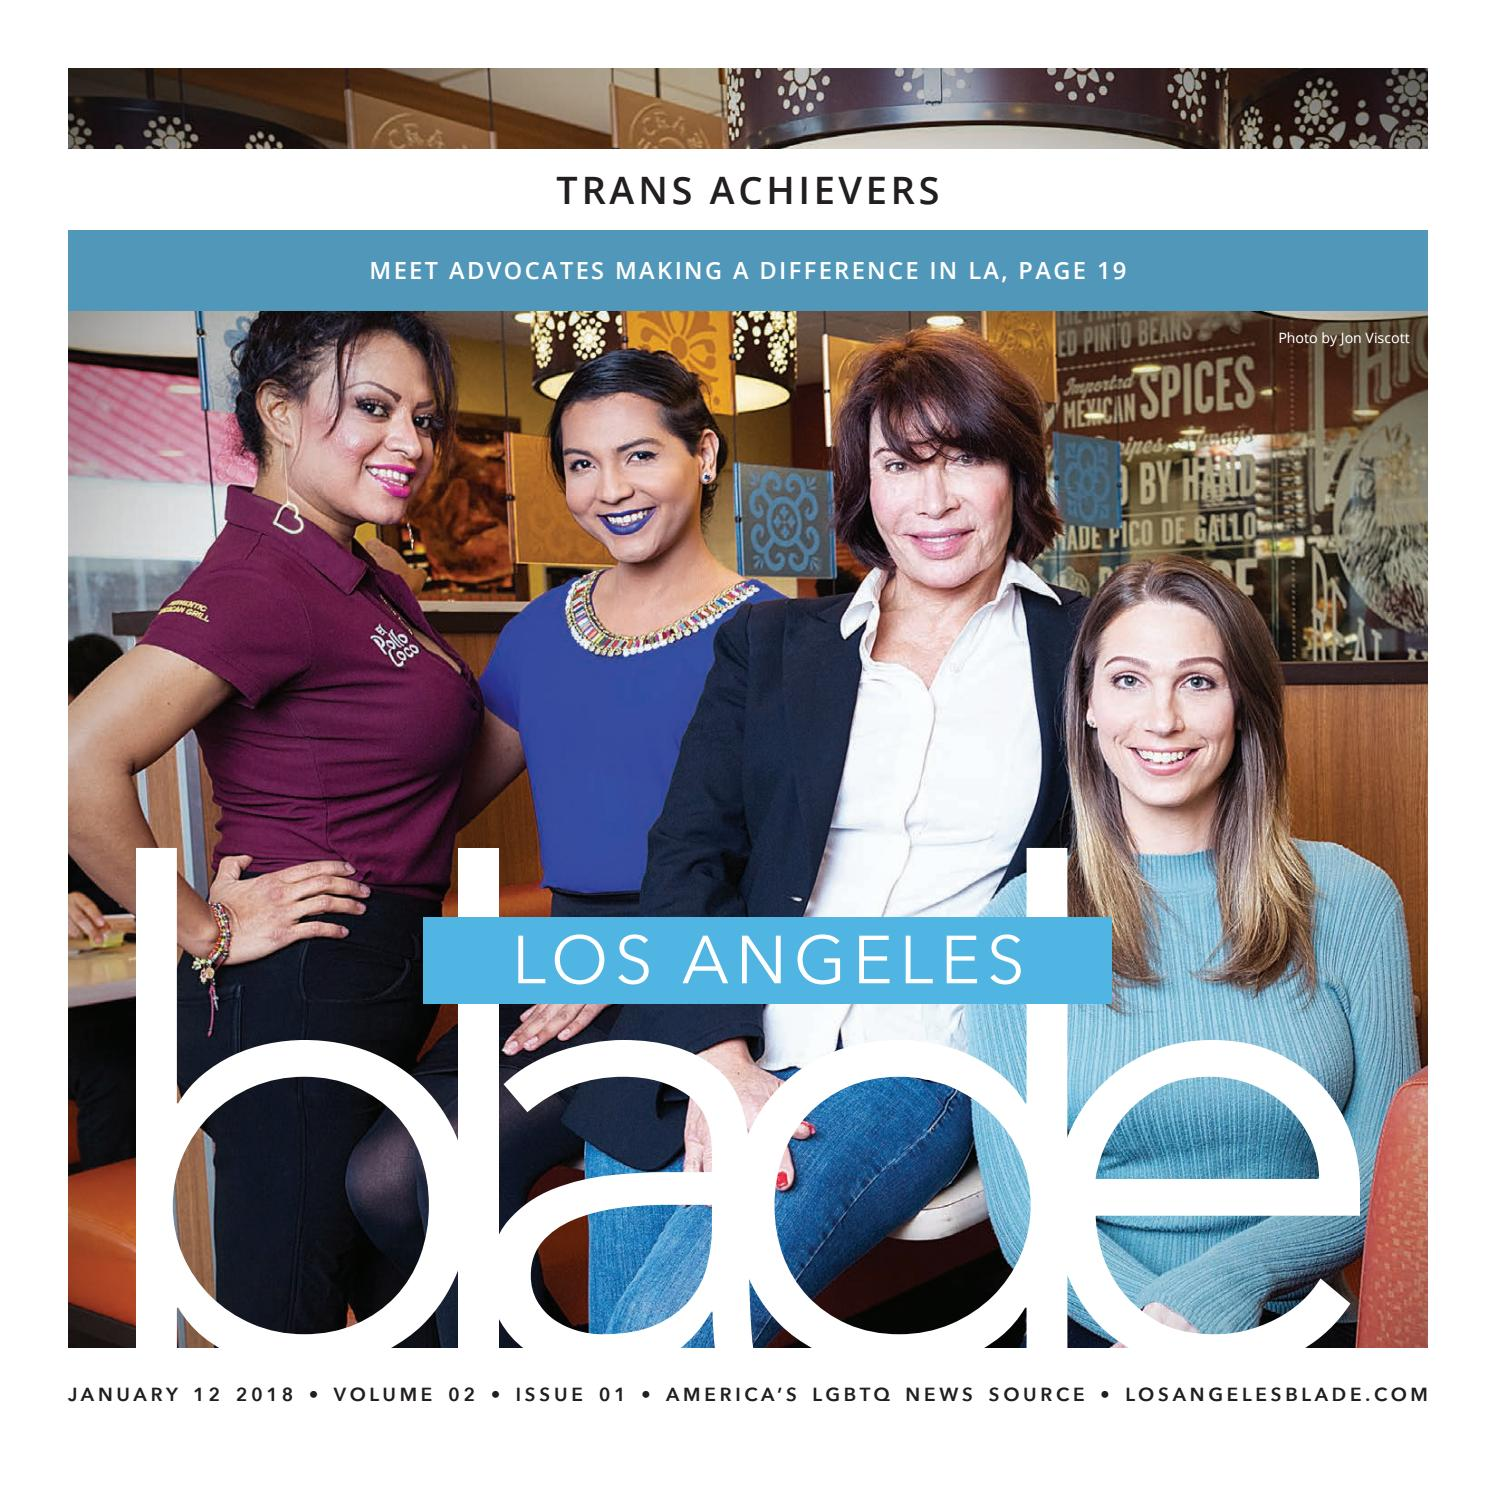 Losangelesblade com, Volume 2, Issue 1, January 12, 2018